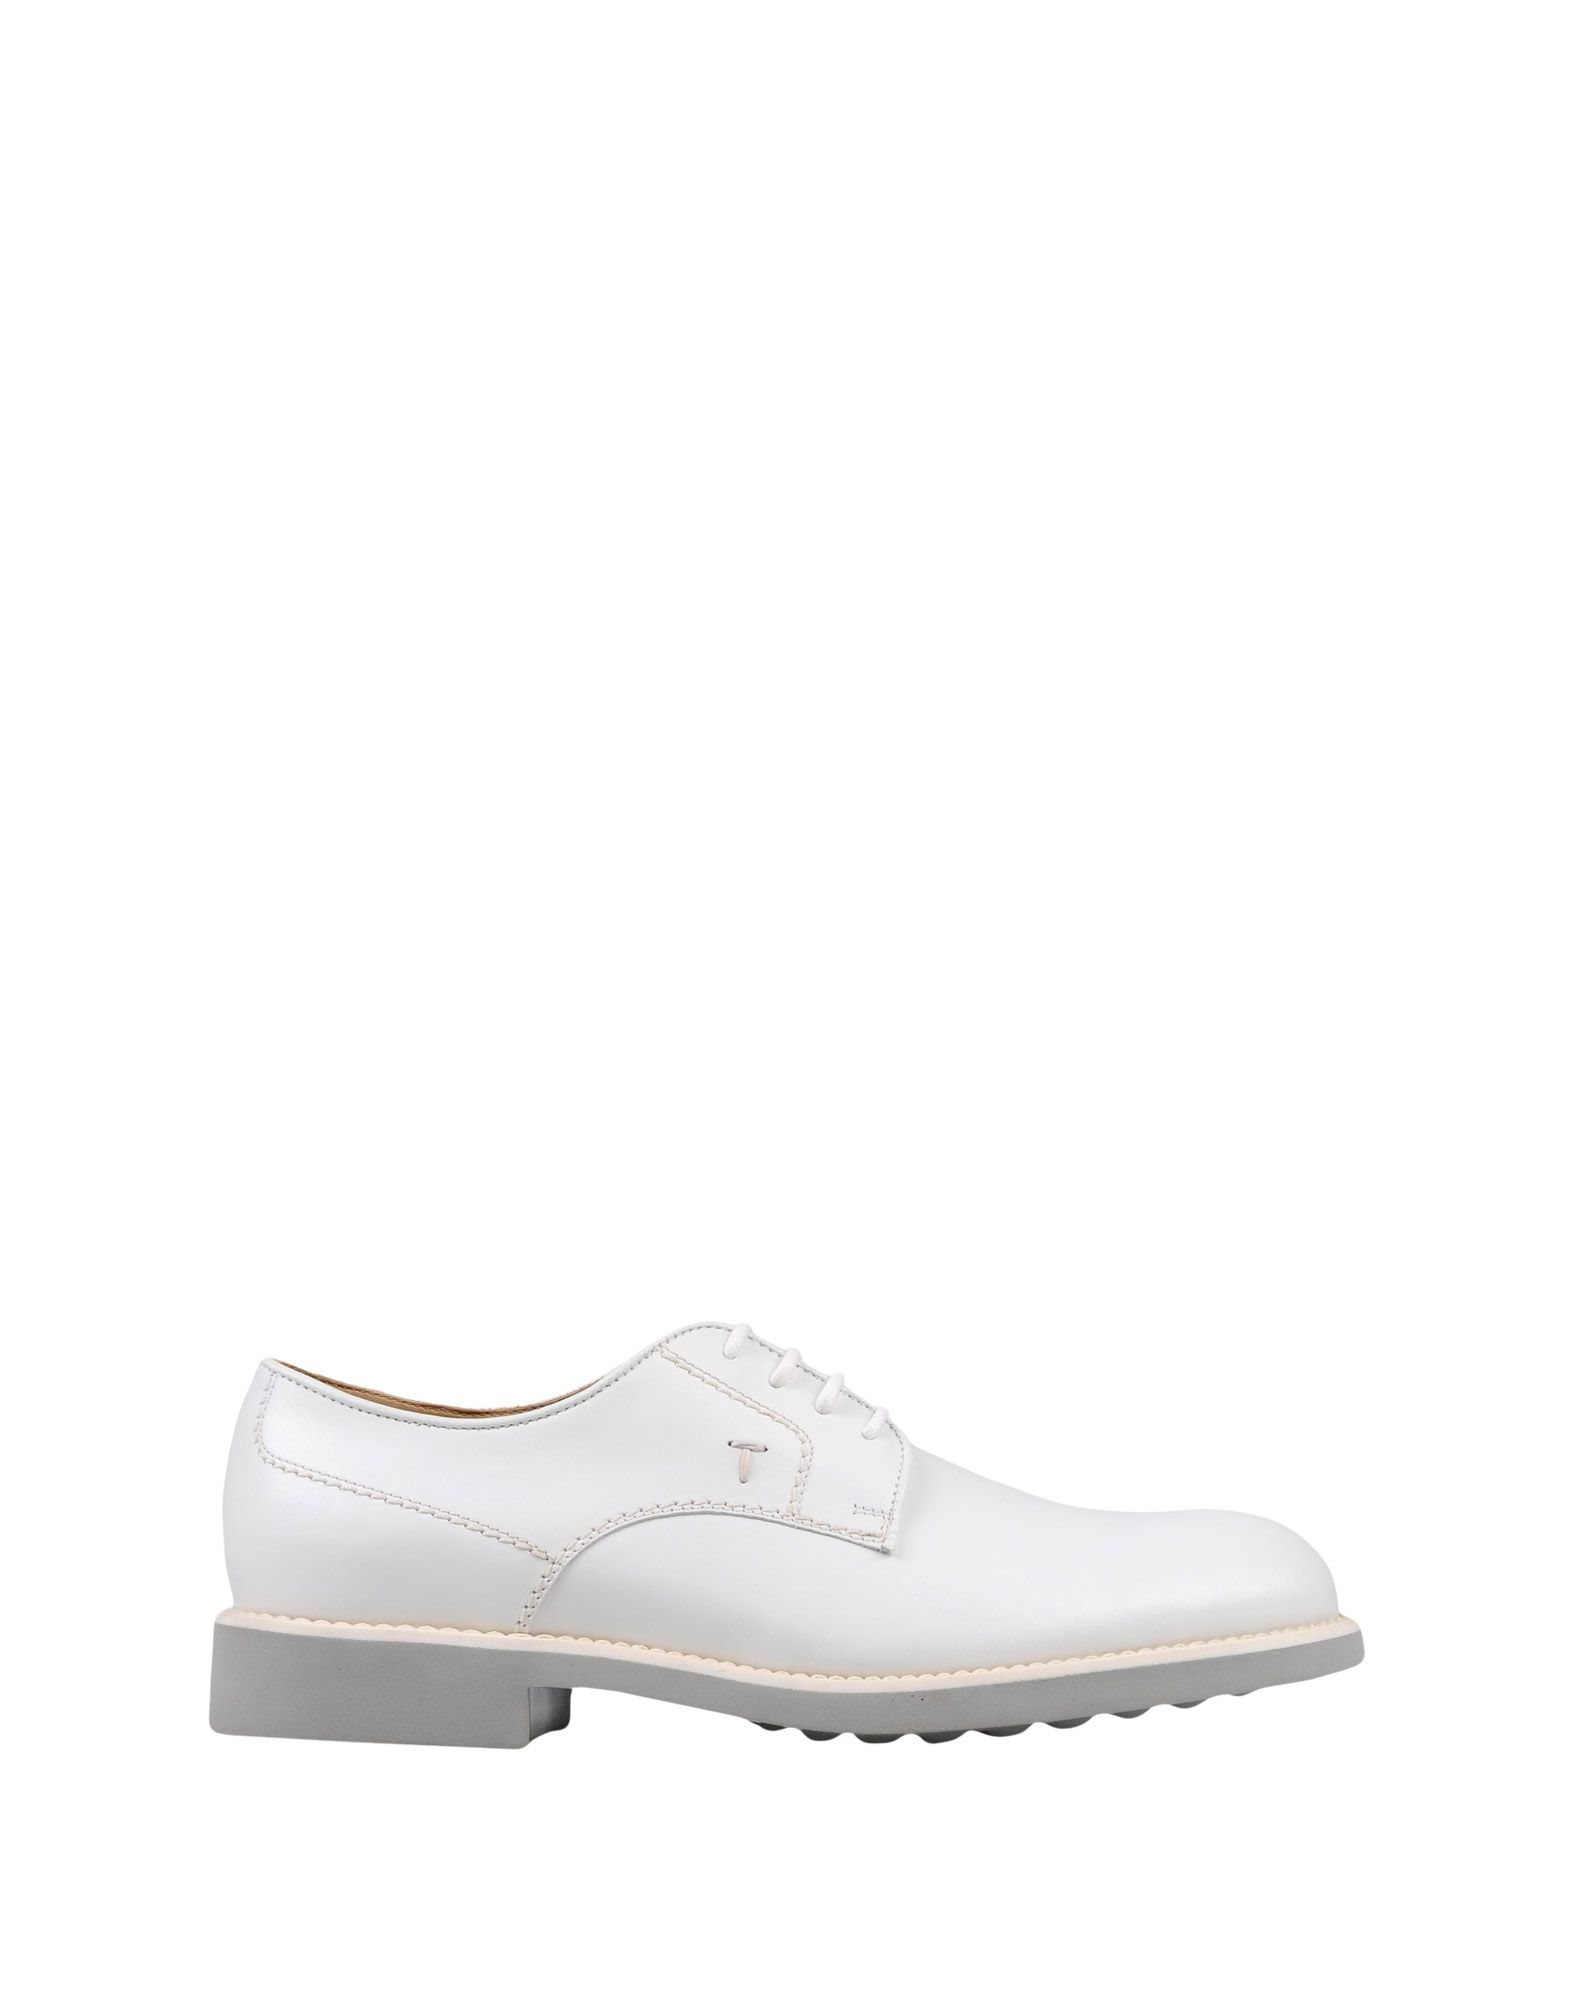 Tod's Schnürschuhe Schuhe Herren  11399088VD Gute Qualität beliebte Schuhe Schnürschuhe 01c1c9